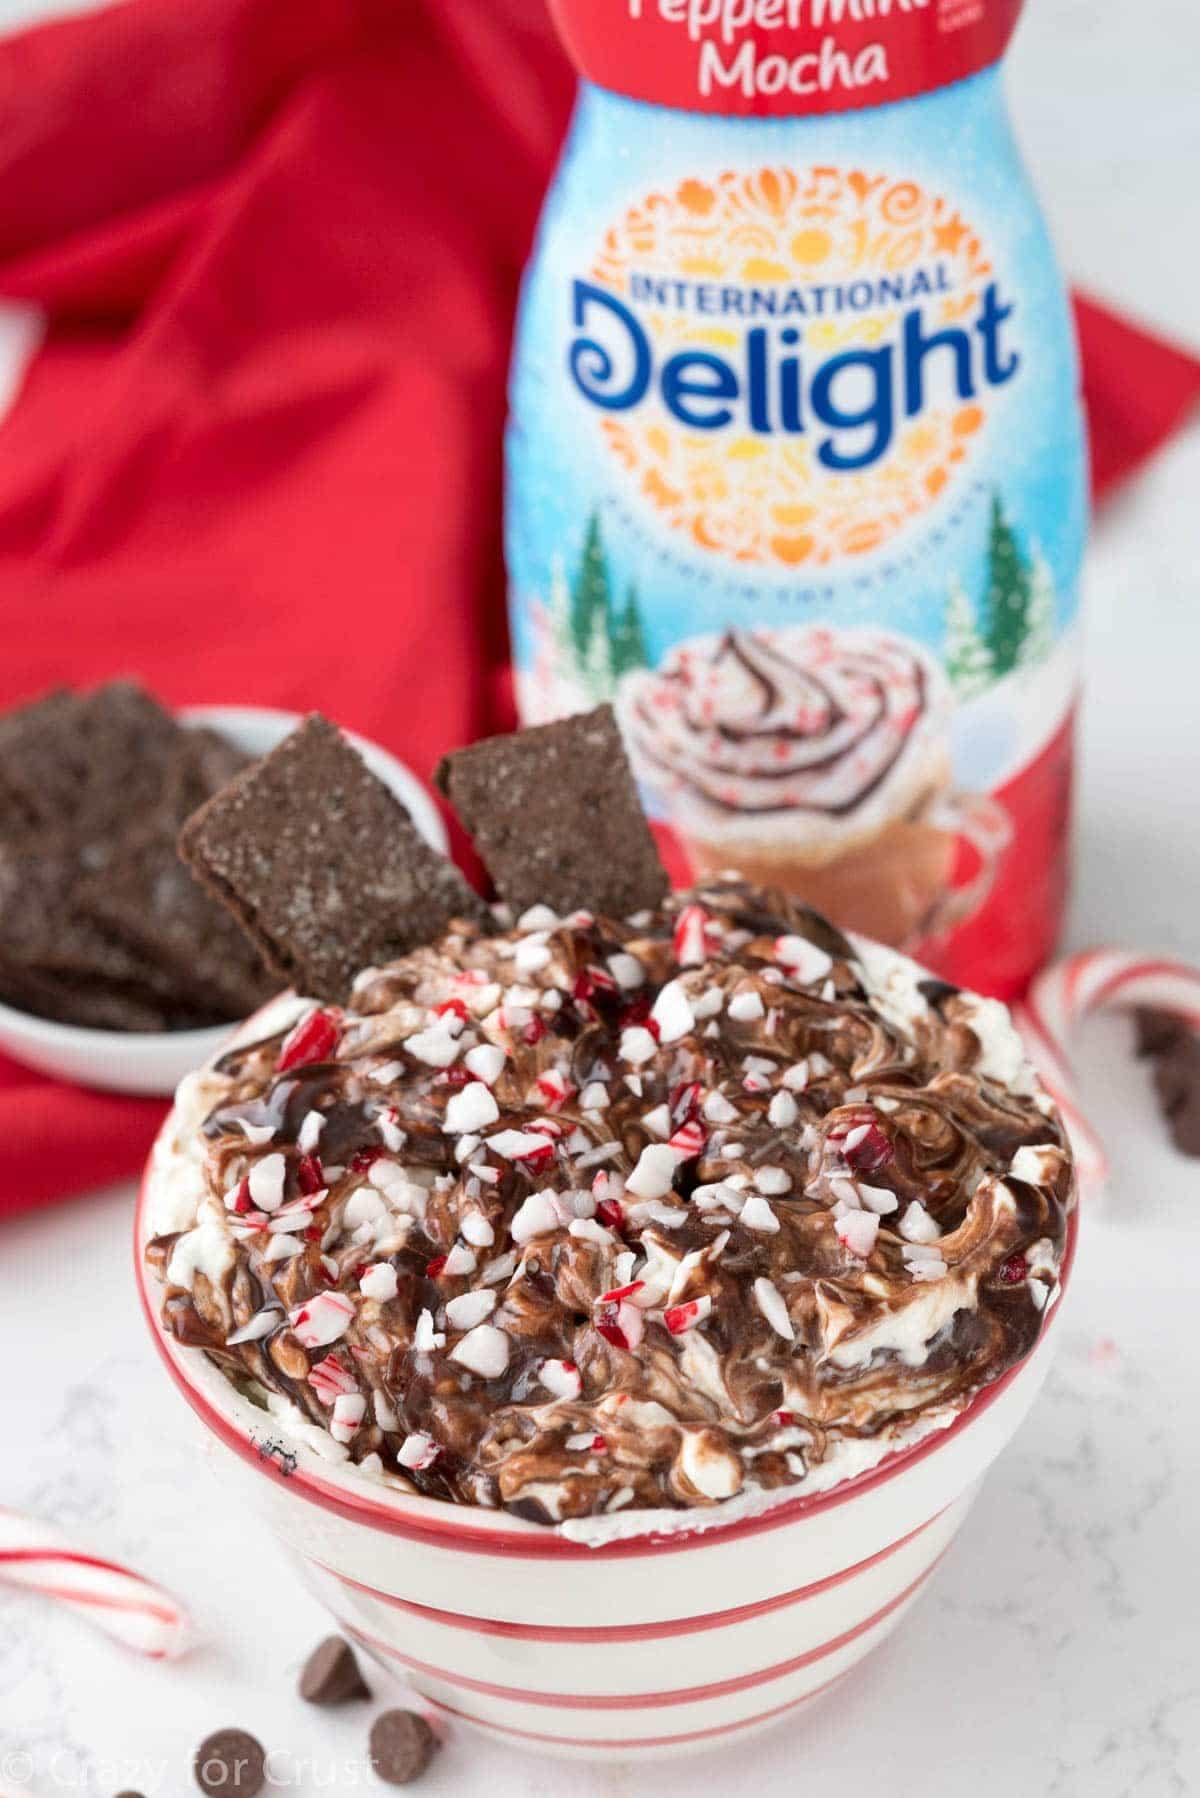 Peppermint Mocha Cheesecake Dip Recipe using International Delight Peppermint Mocha coffee creamer